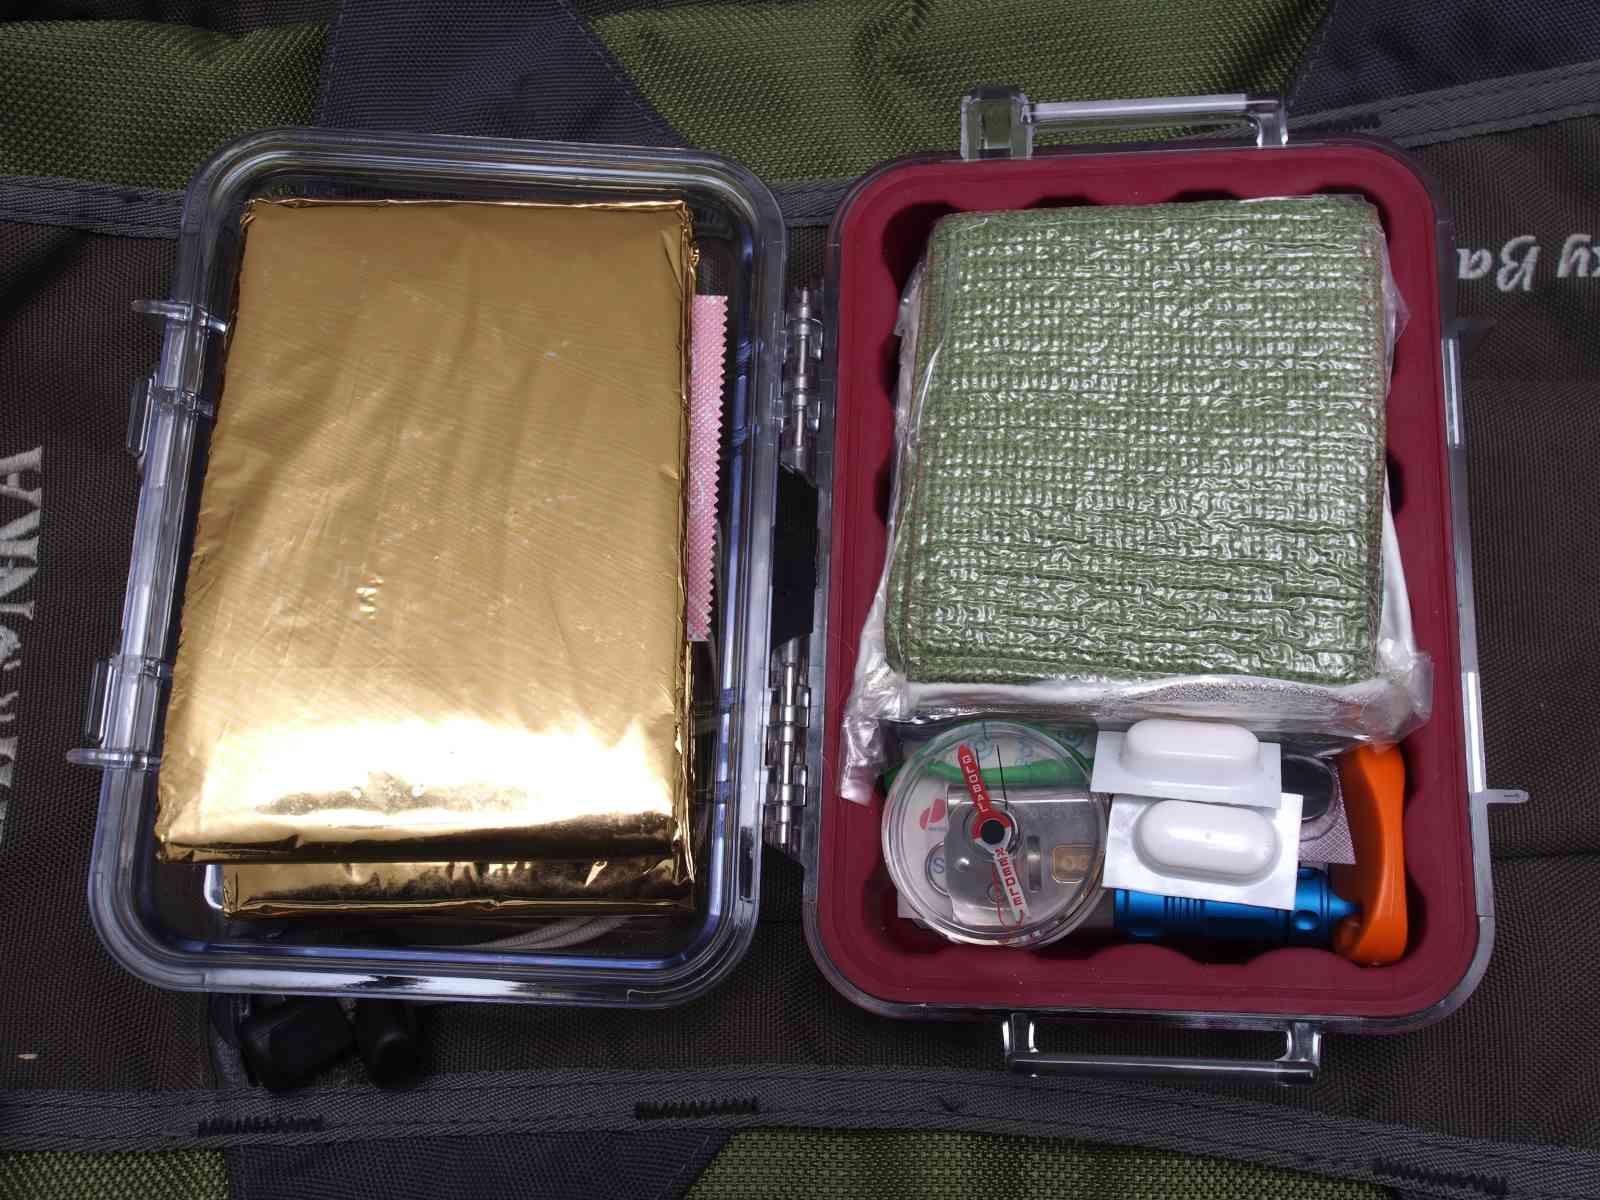 Mein Survival-Kit - Alles drin